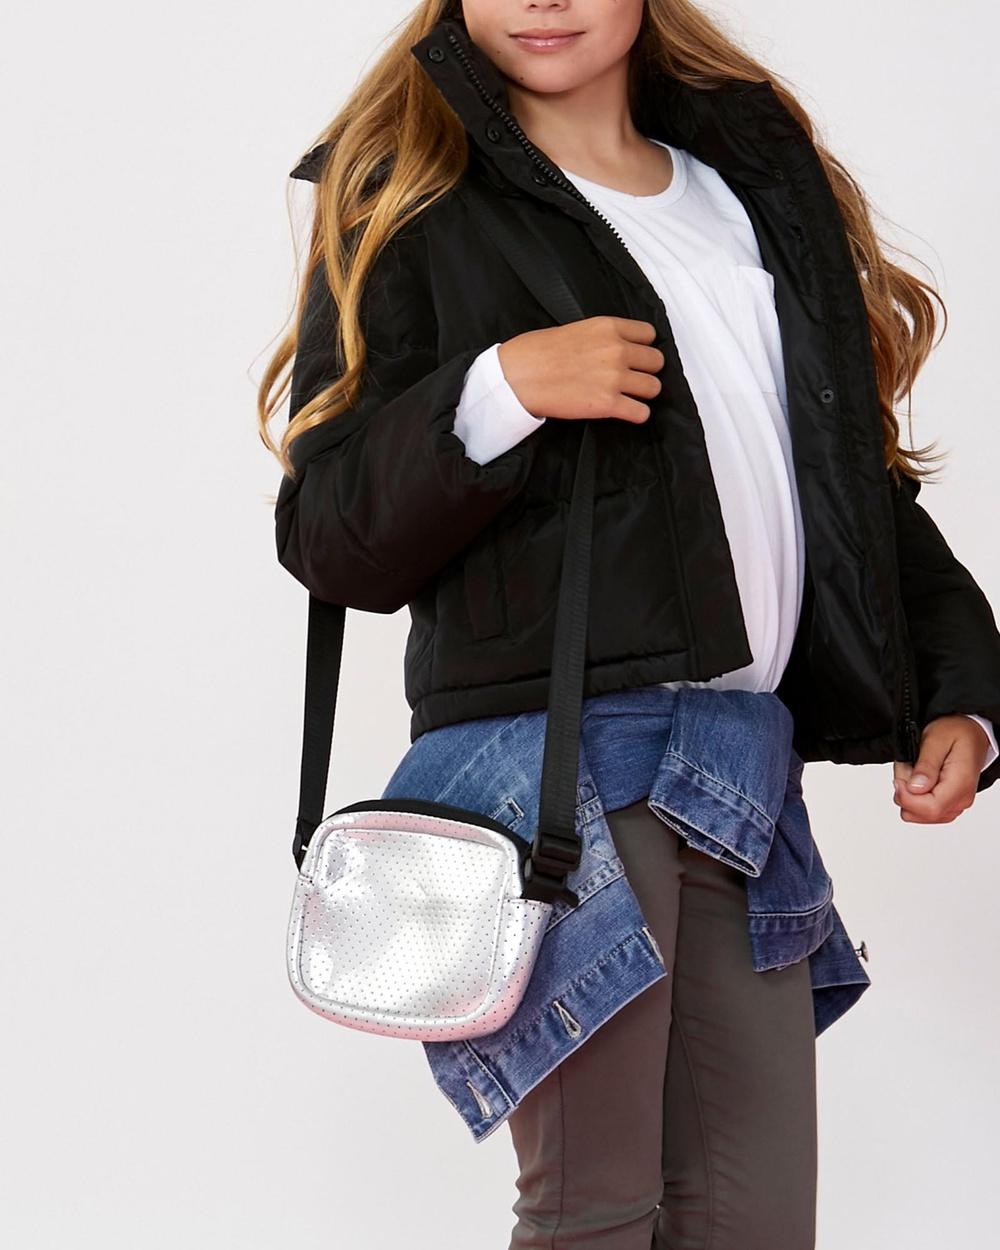 Decjuba Kids Aria Crossbody Teens Bags Silver & Black